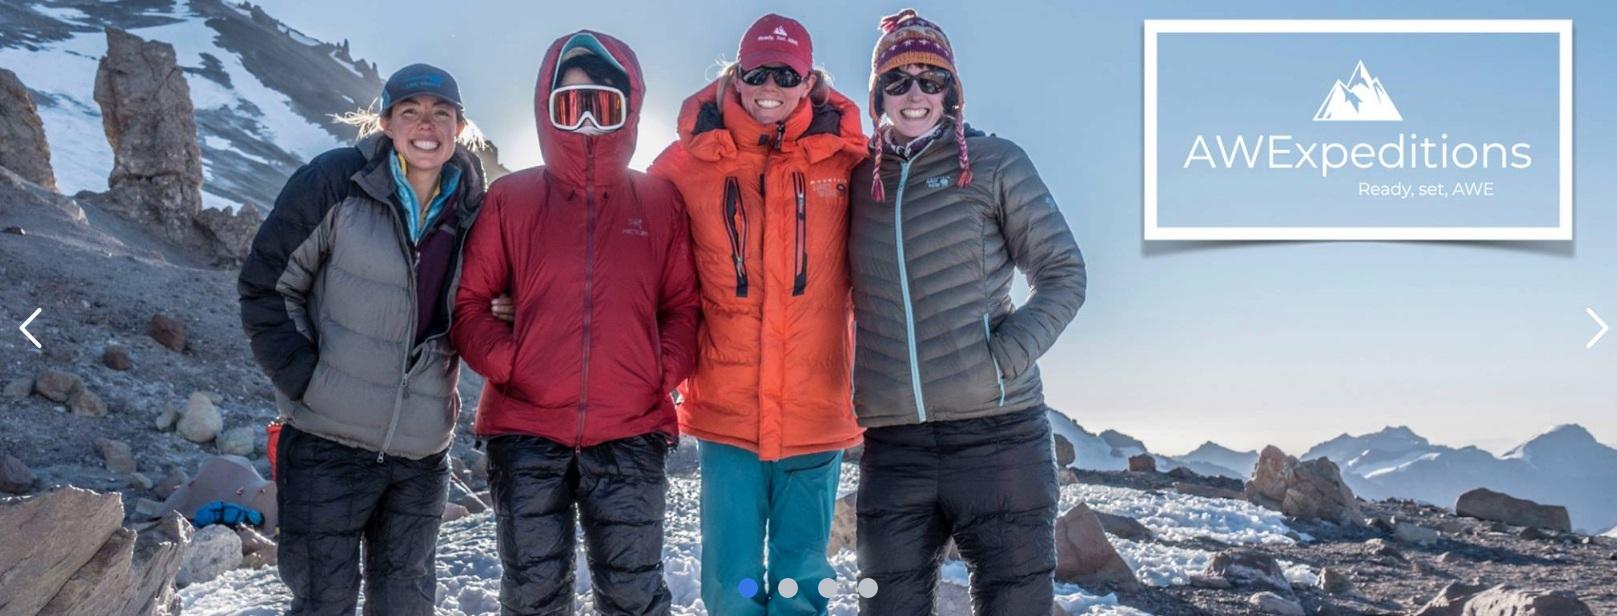 Aurora Women's Expeditions.jpg